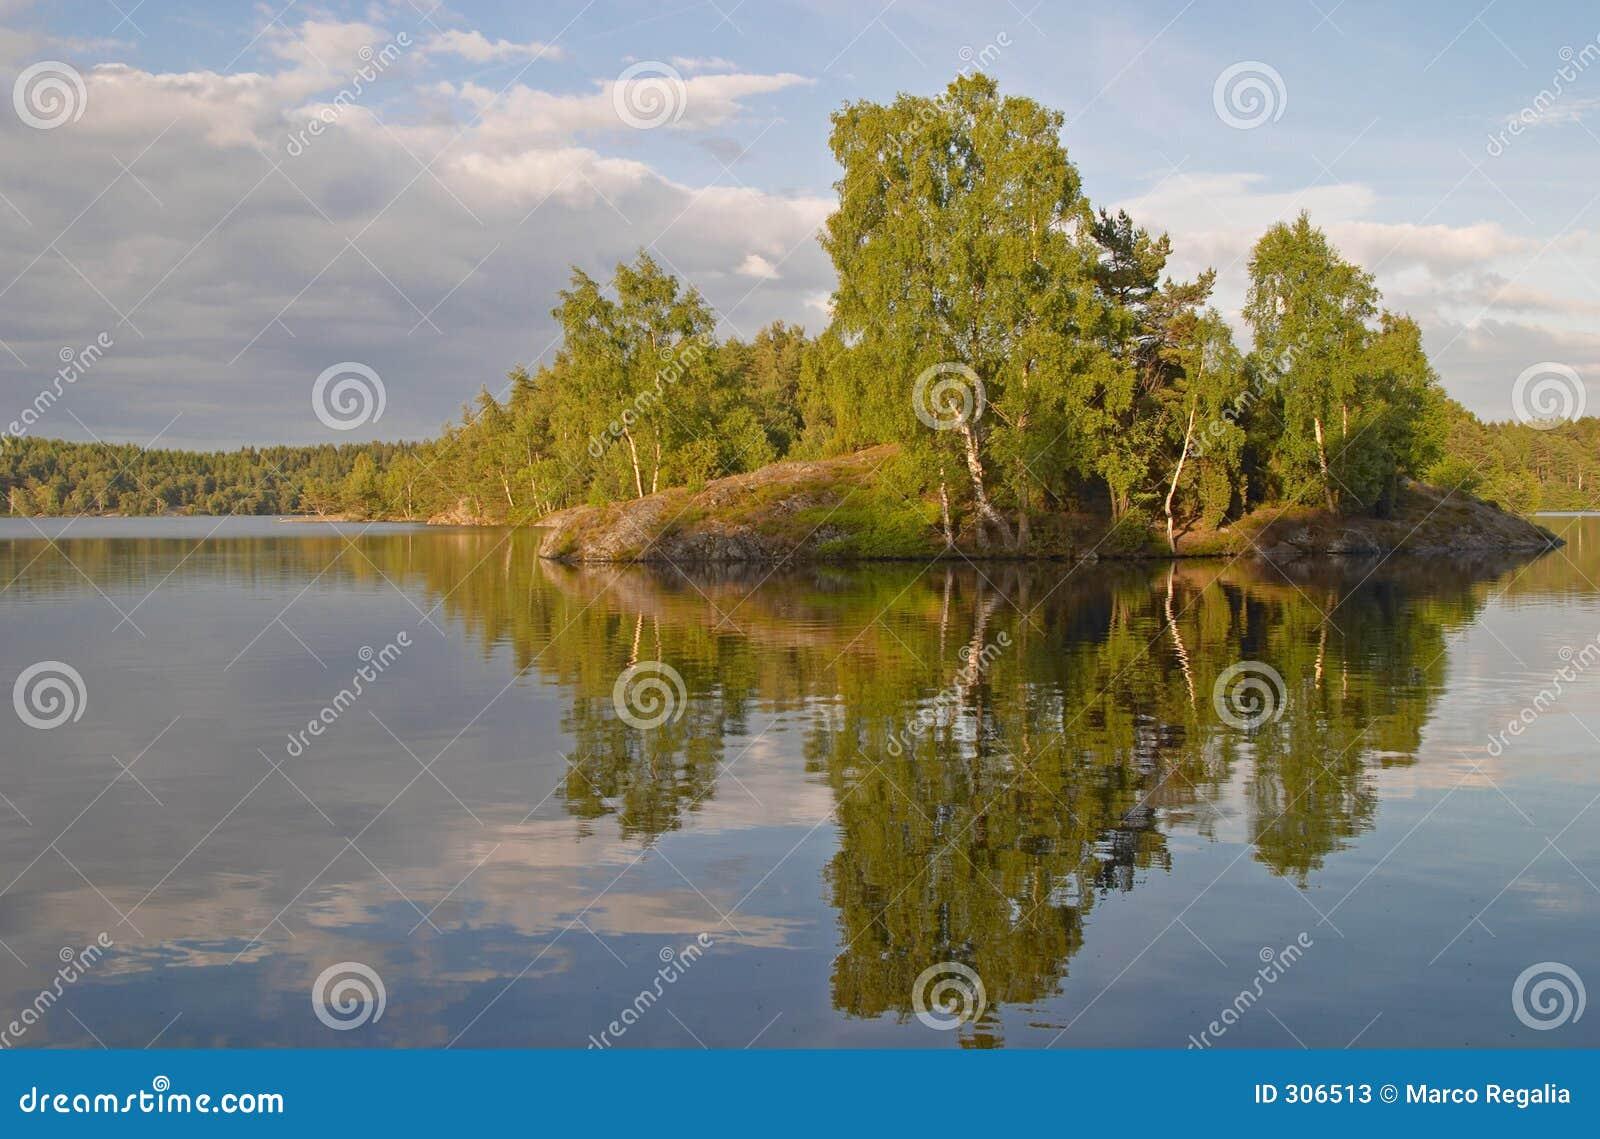 Isola in un lago svedese